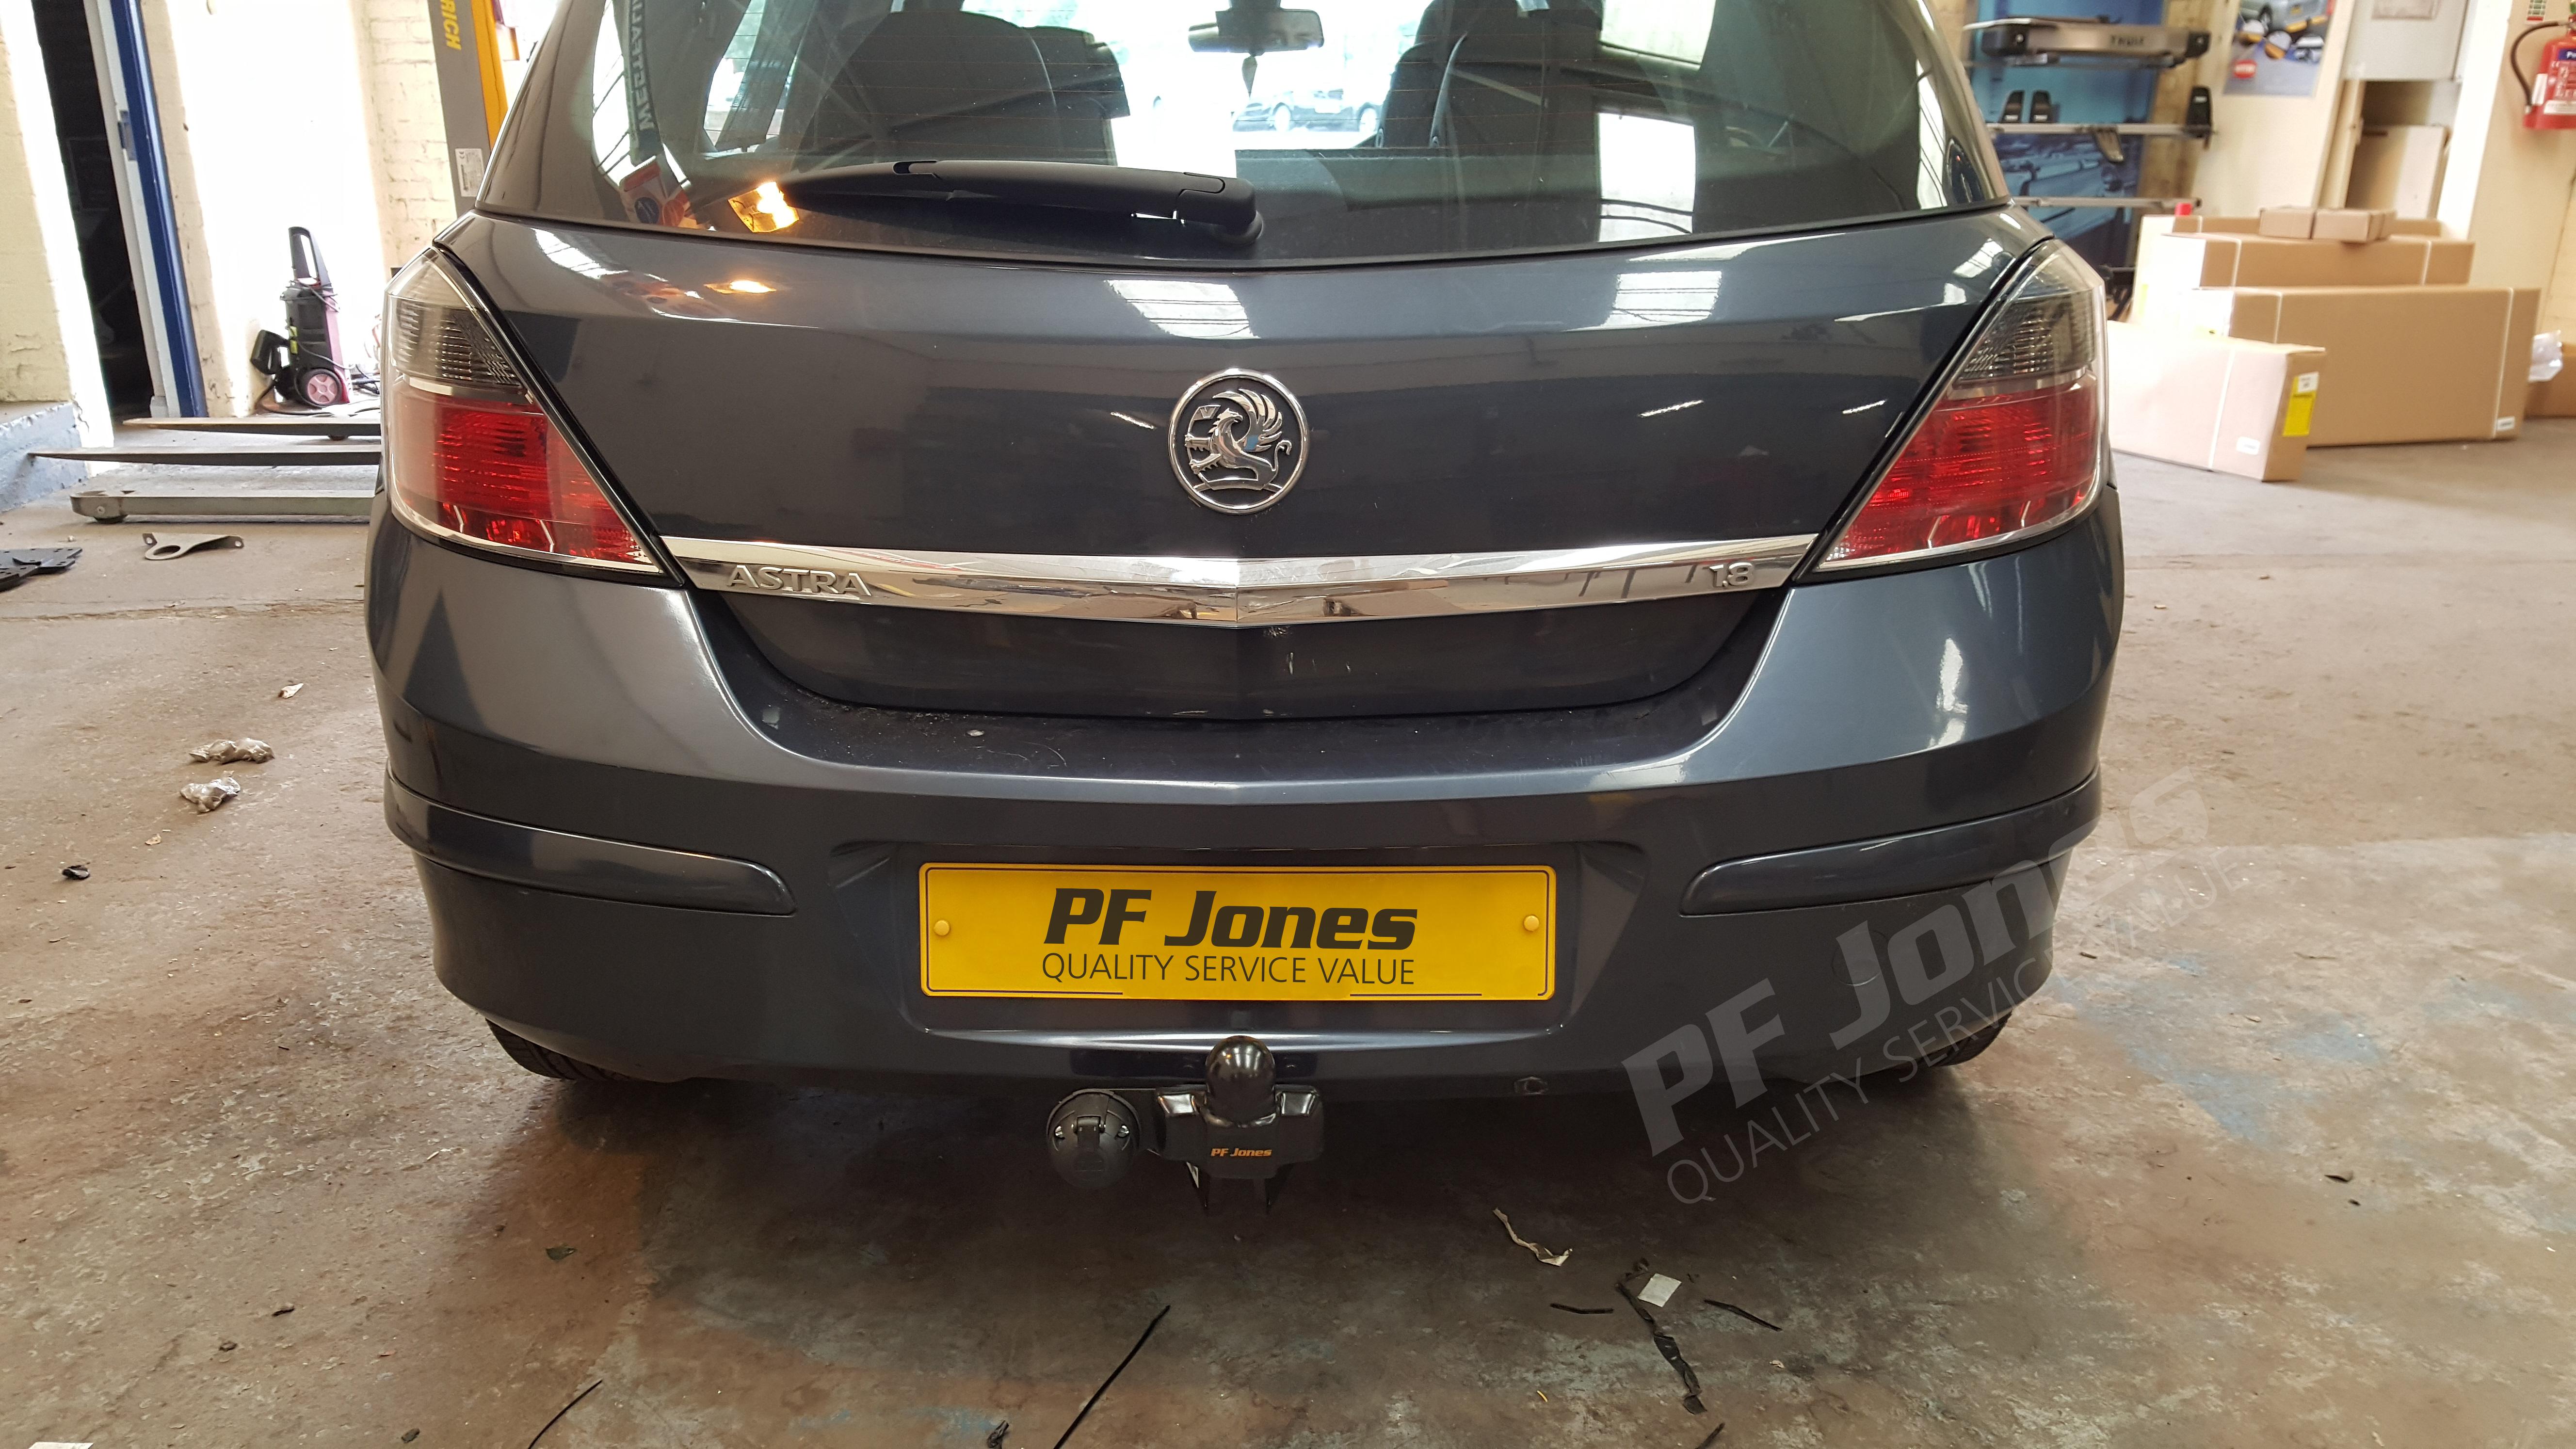 Vauxhall Astra Towbar Wiring Kits PF Jones Witter Tow dinocroinfo